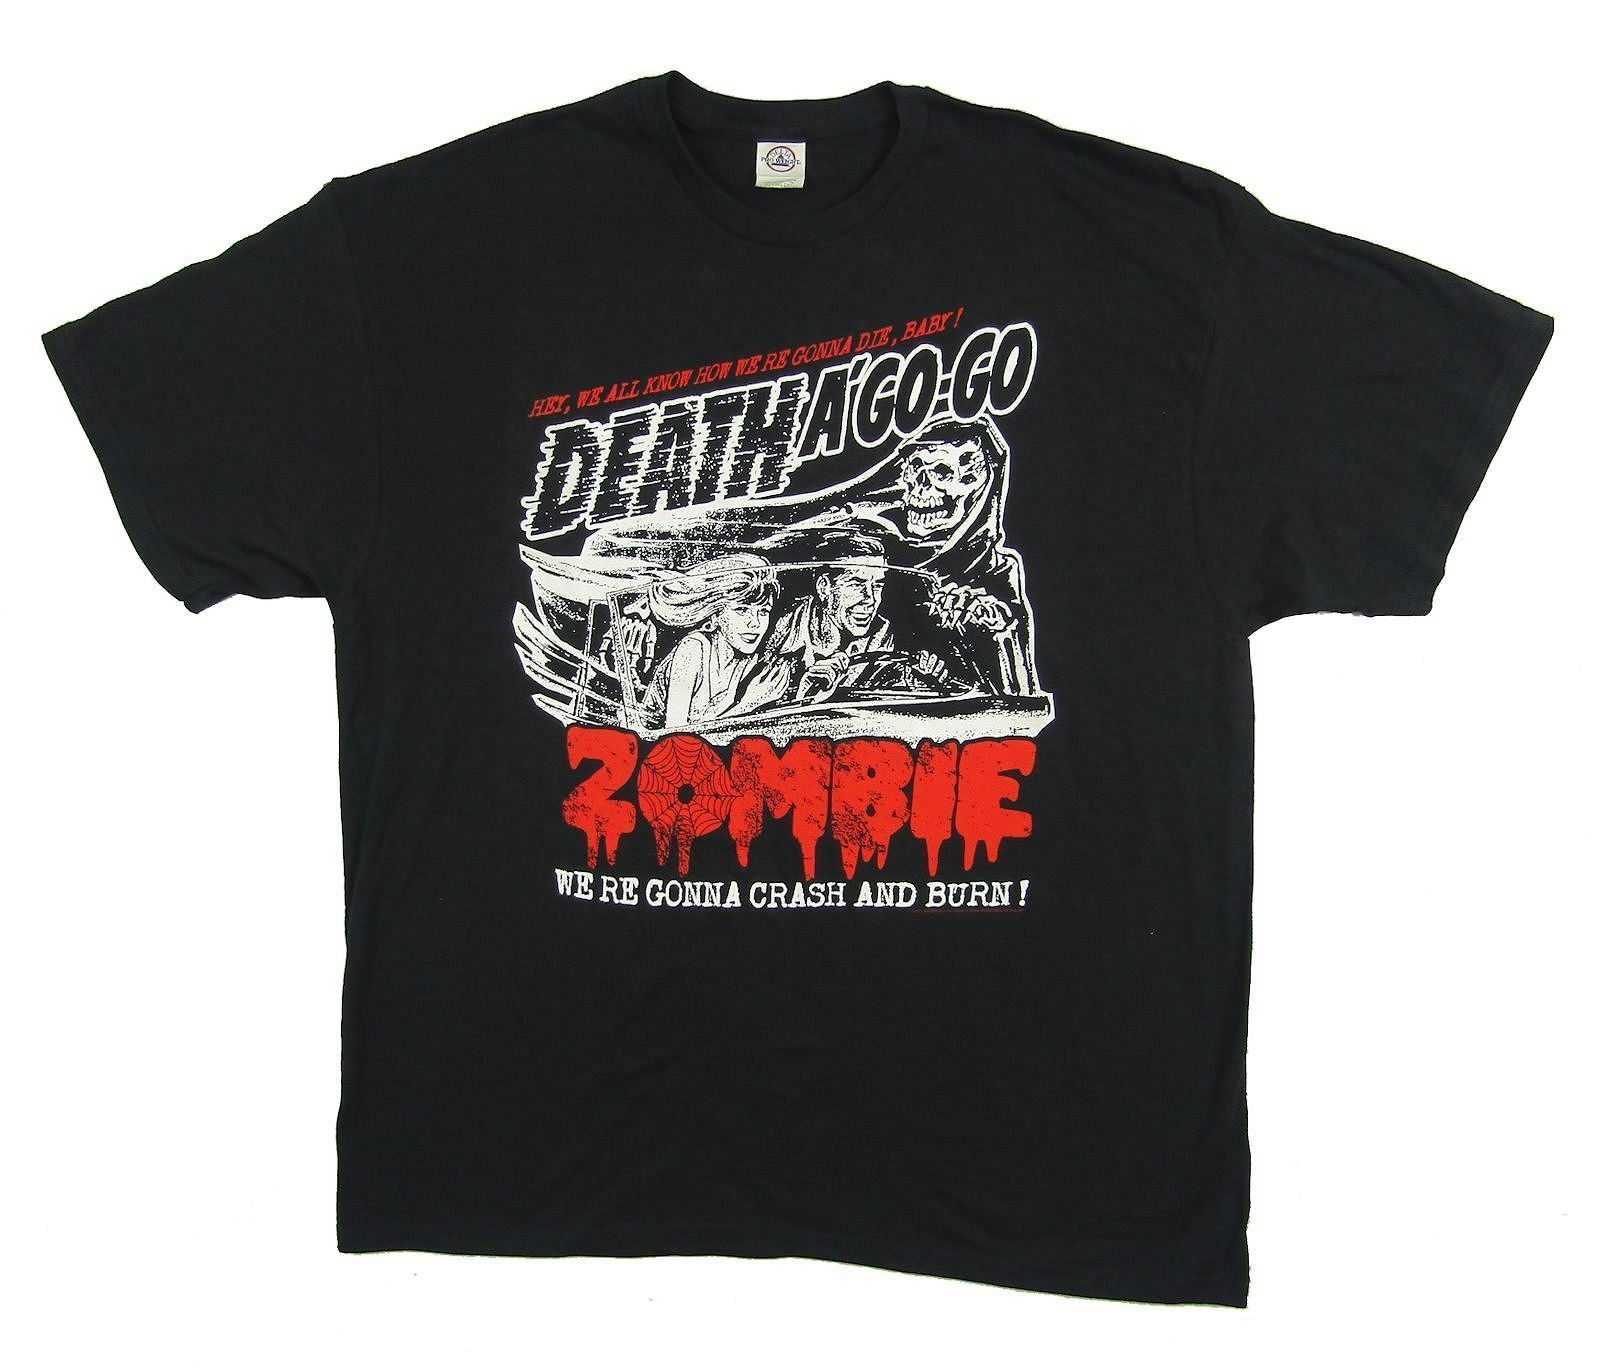 Rob Zombie Crash & Burn Death A Go Go Black T Shirt New Official Merch T Shirt Short Sleeve